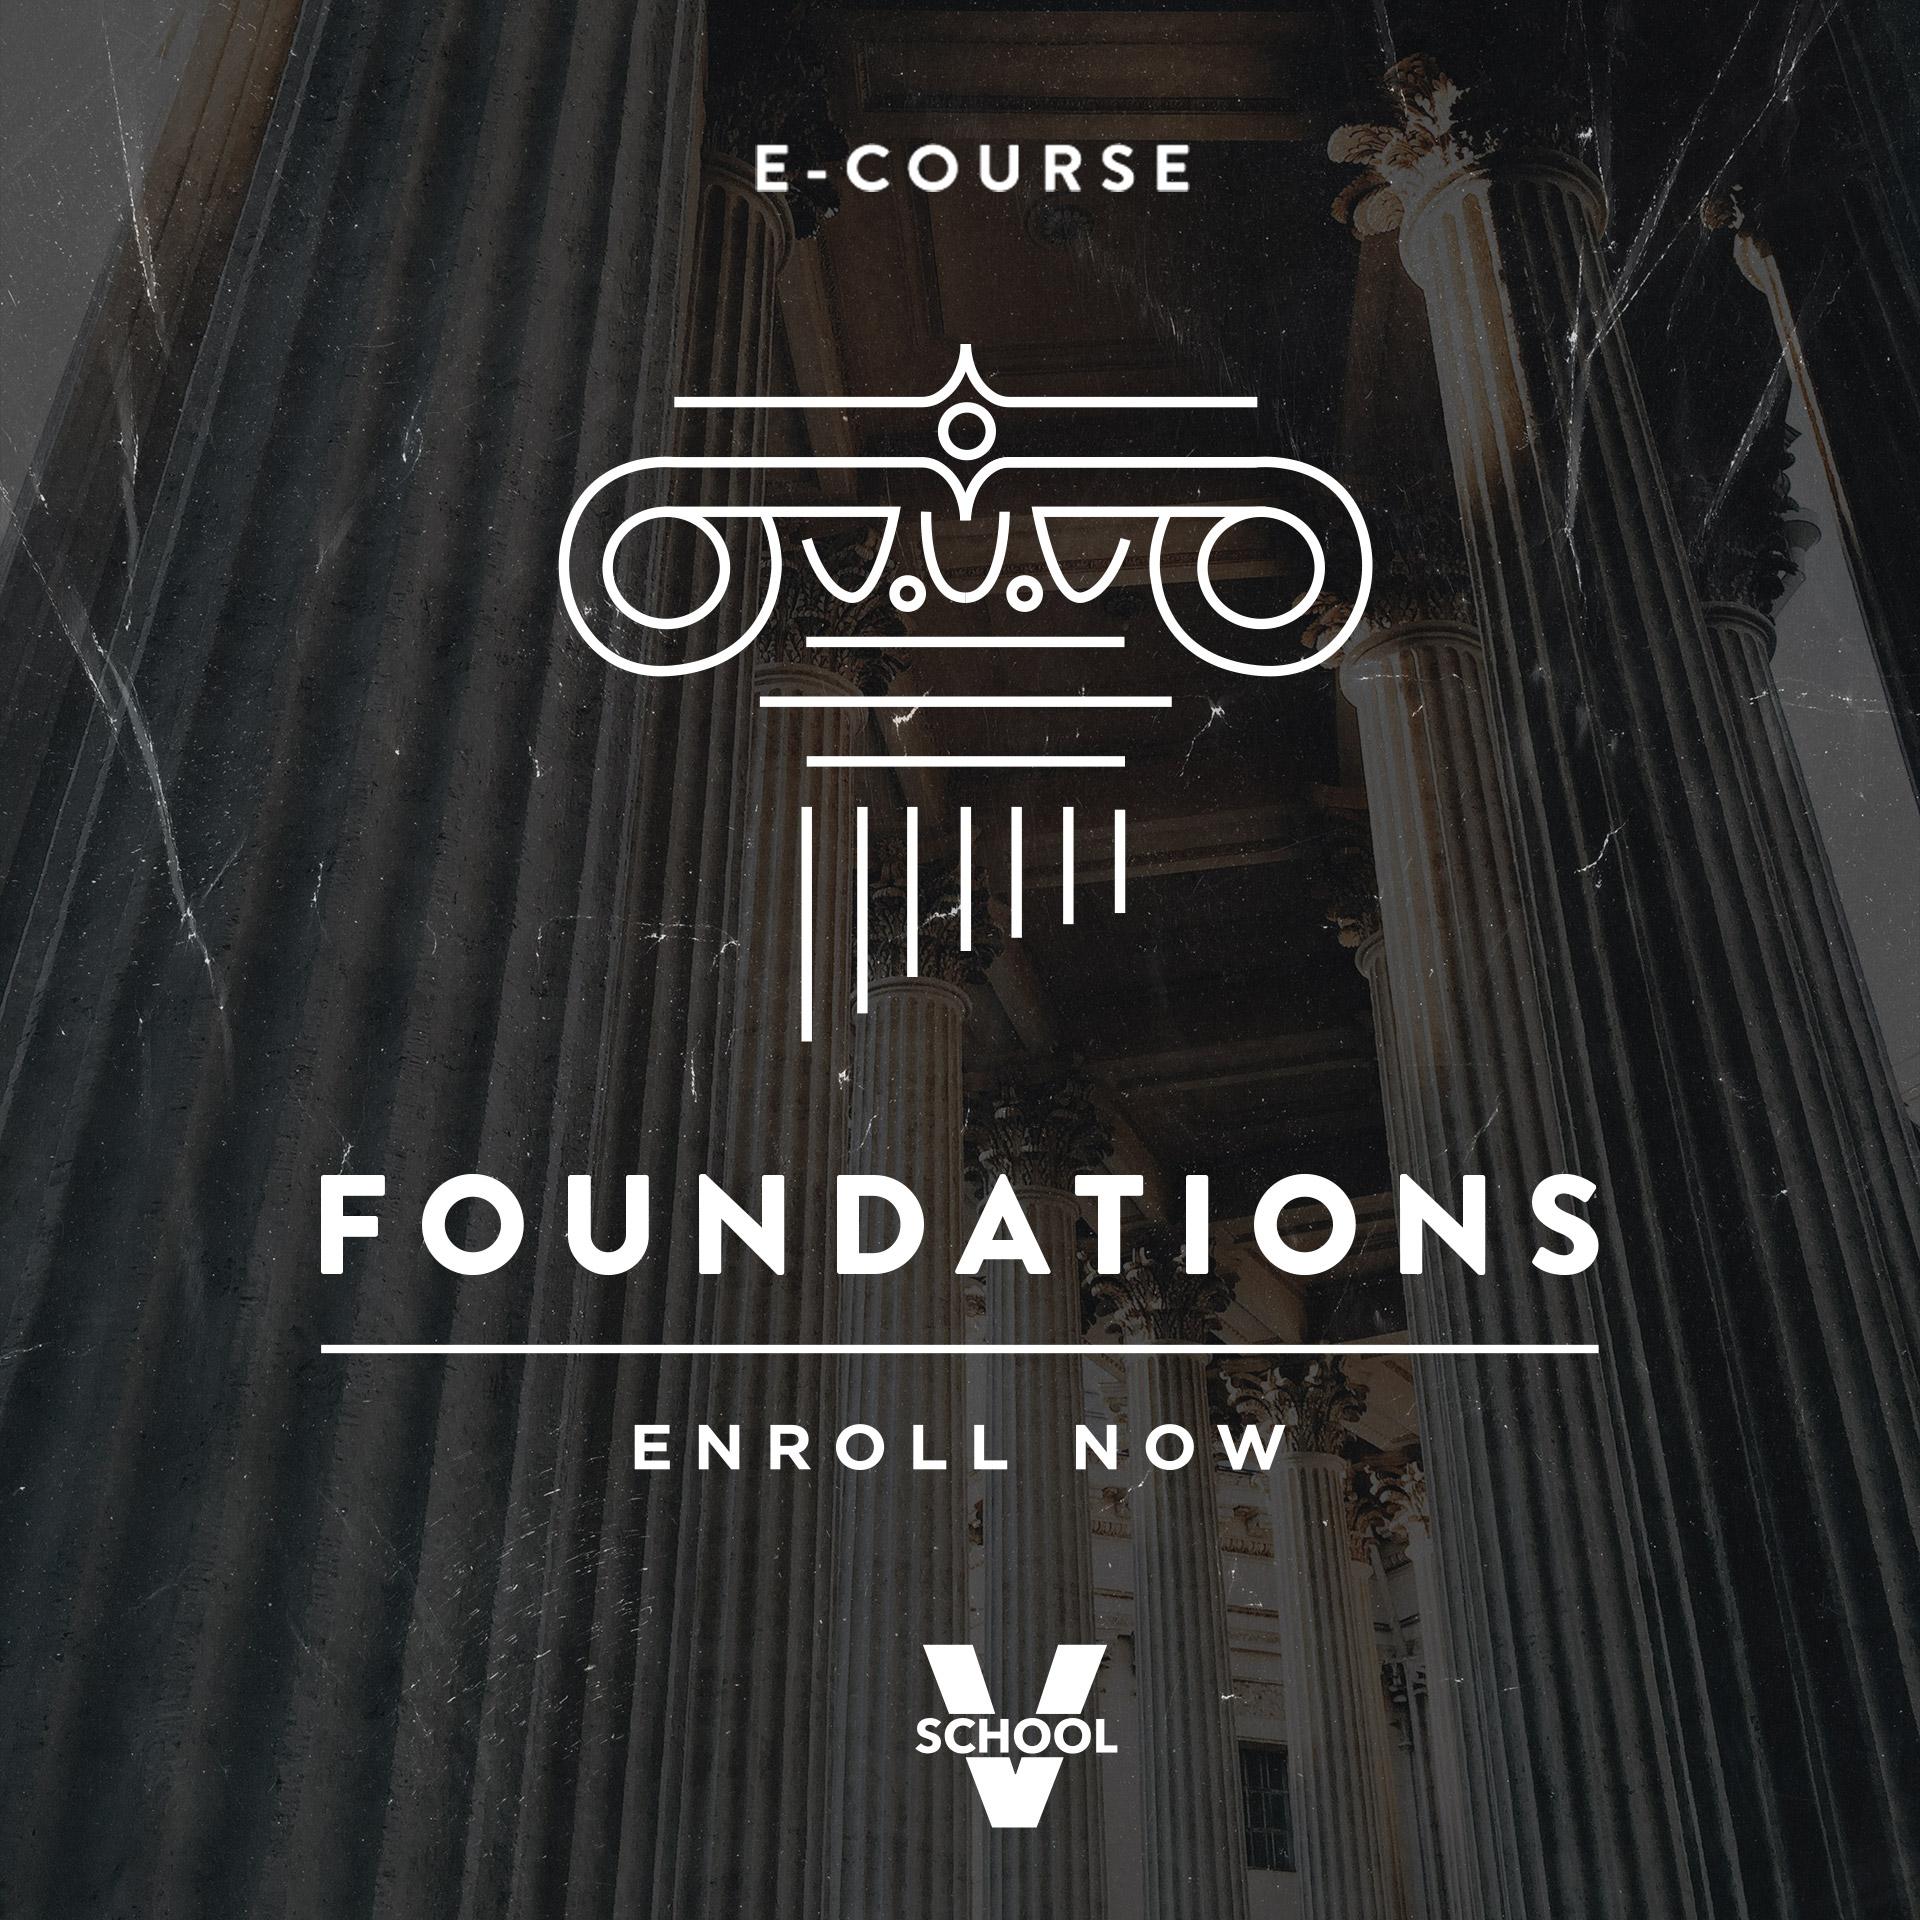 https://www.vladschool.com/courses/Foundations